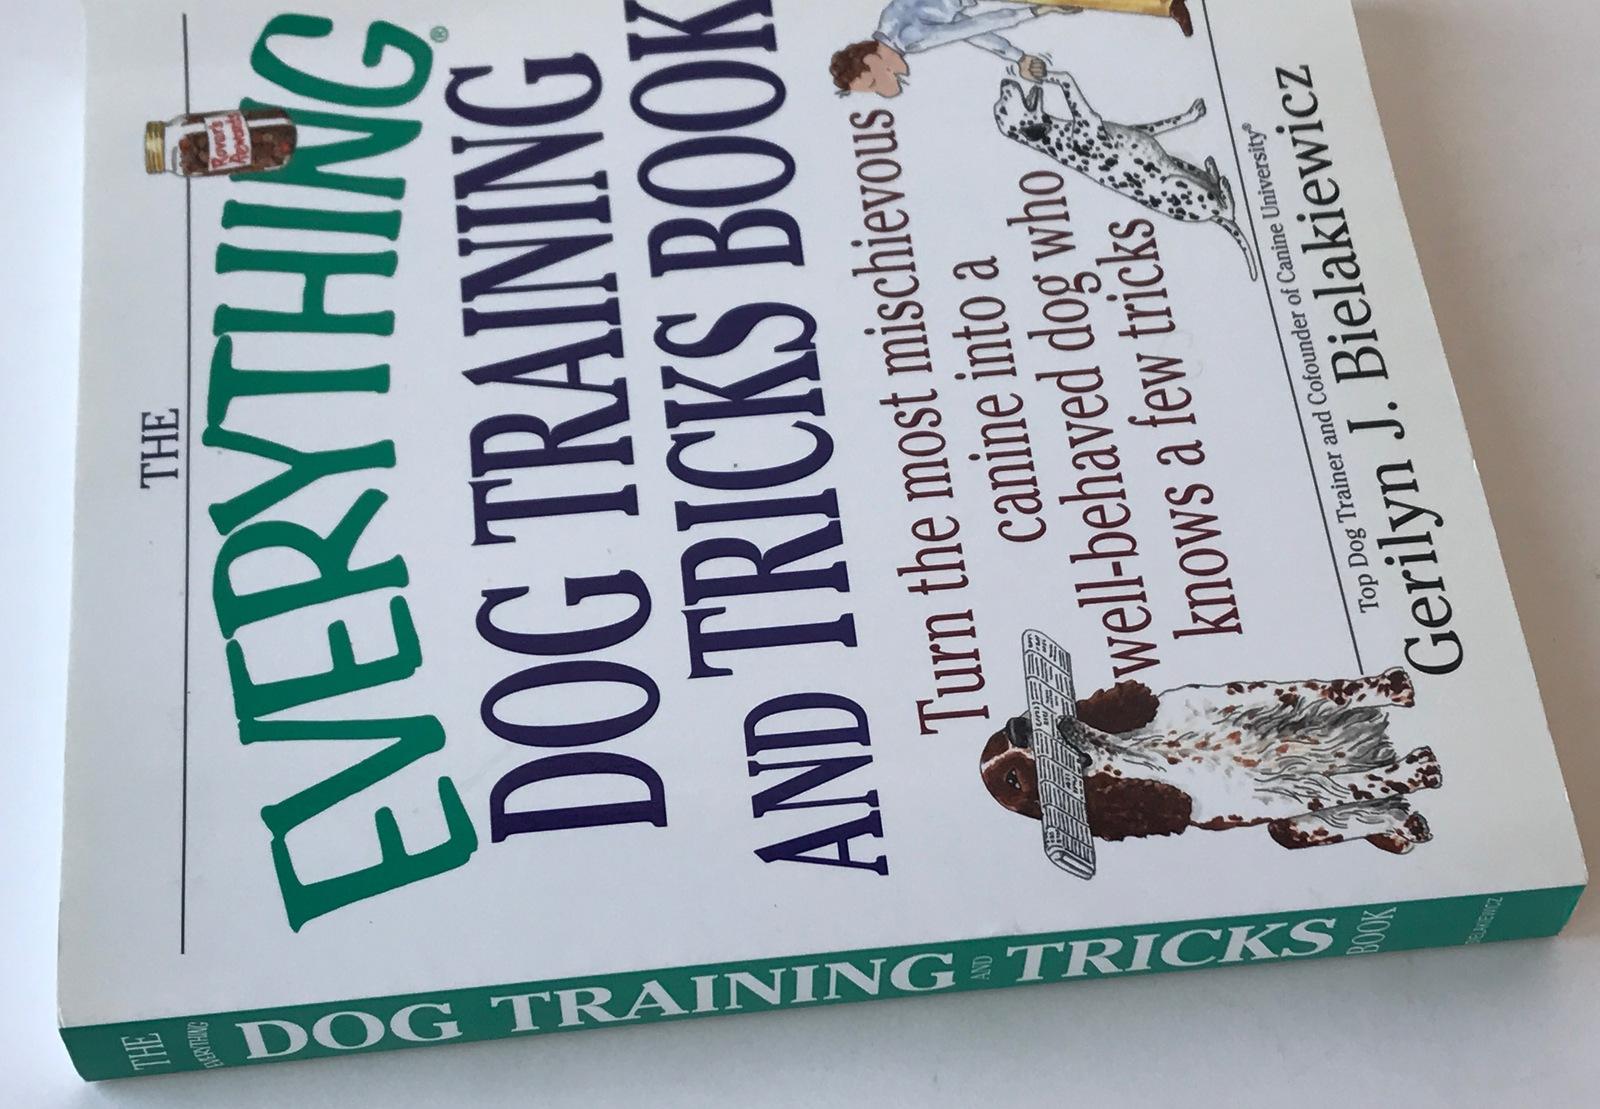 Everything Dog Training and Tricks Book Gerilyn J Bielakiewicz